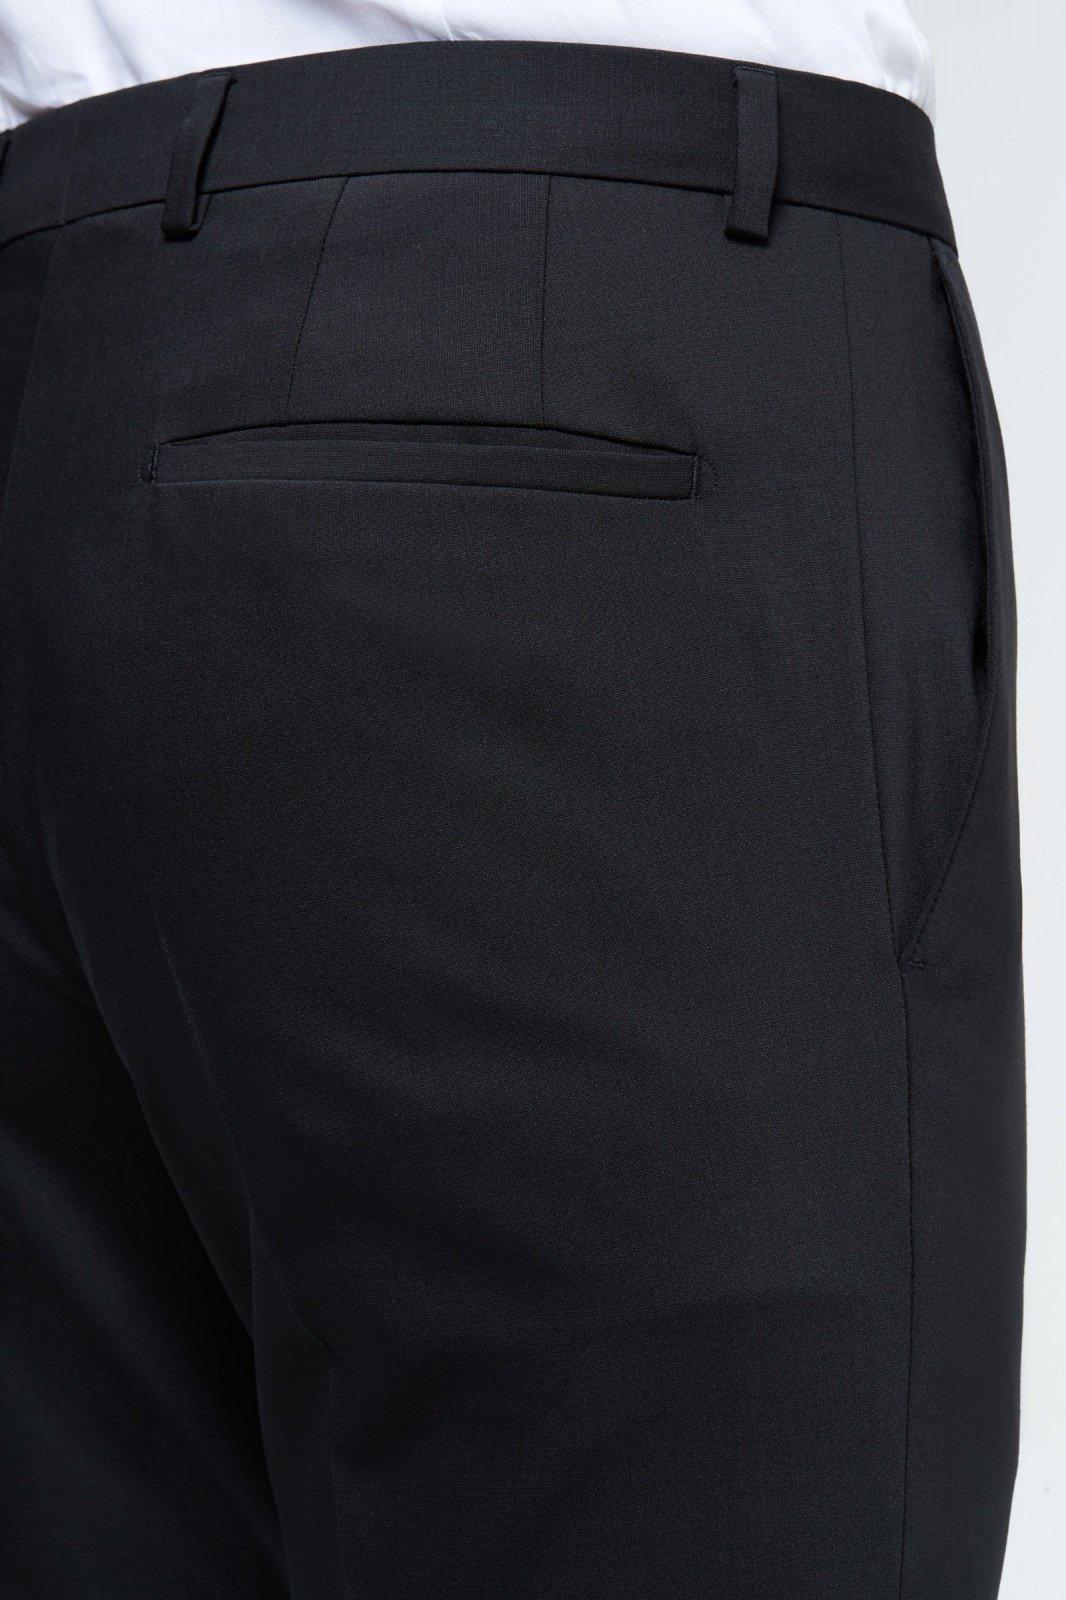 STRELLSON Pantalon ville noir - MADDEN , Pantalon pour Homme 55fc1cff0a8a